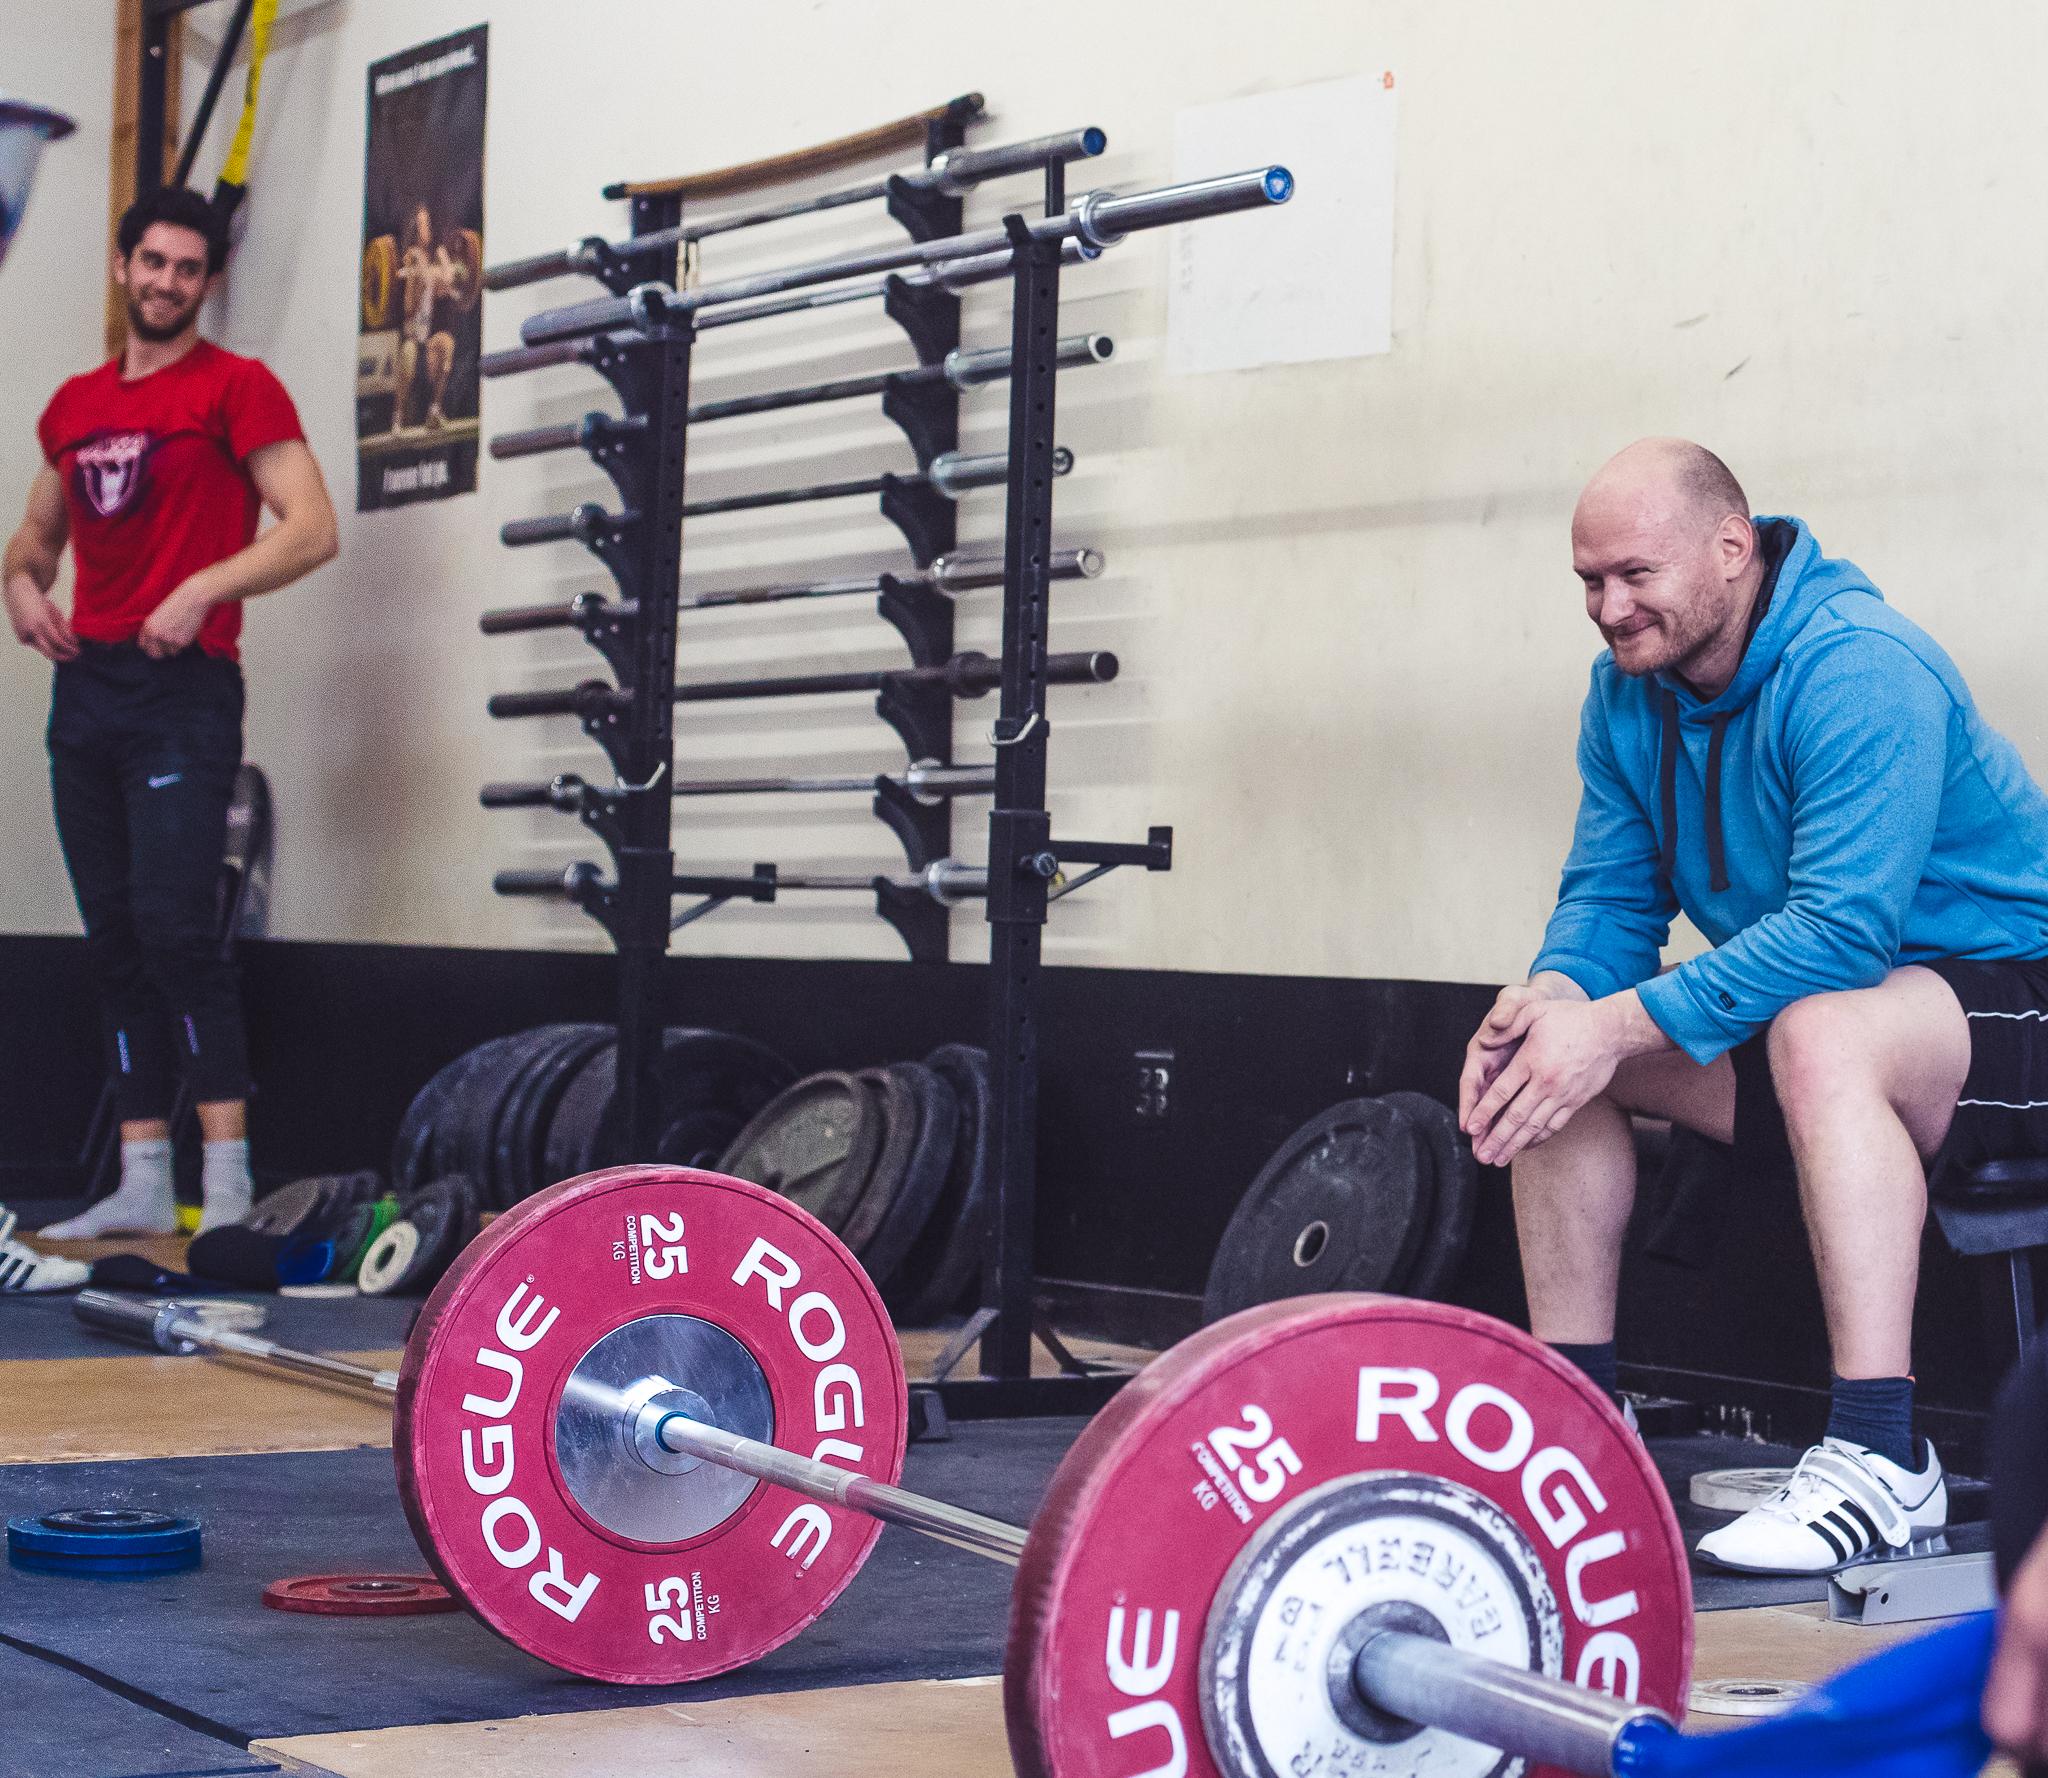 yasha-kahn-weightlifting-coach-17.jpg